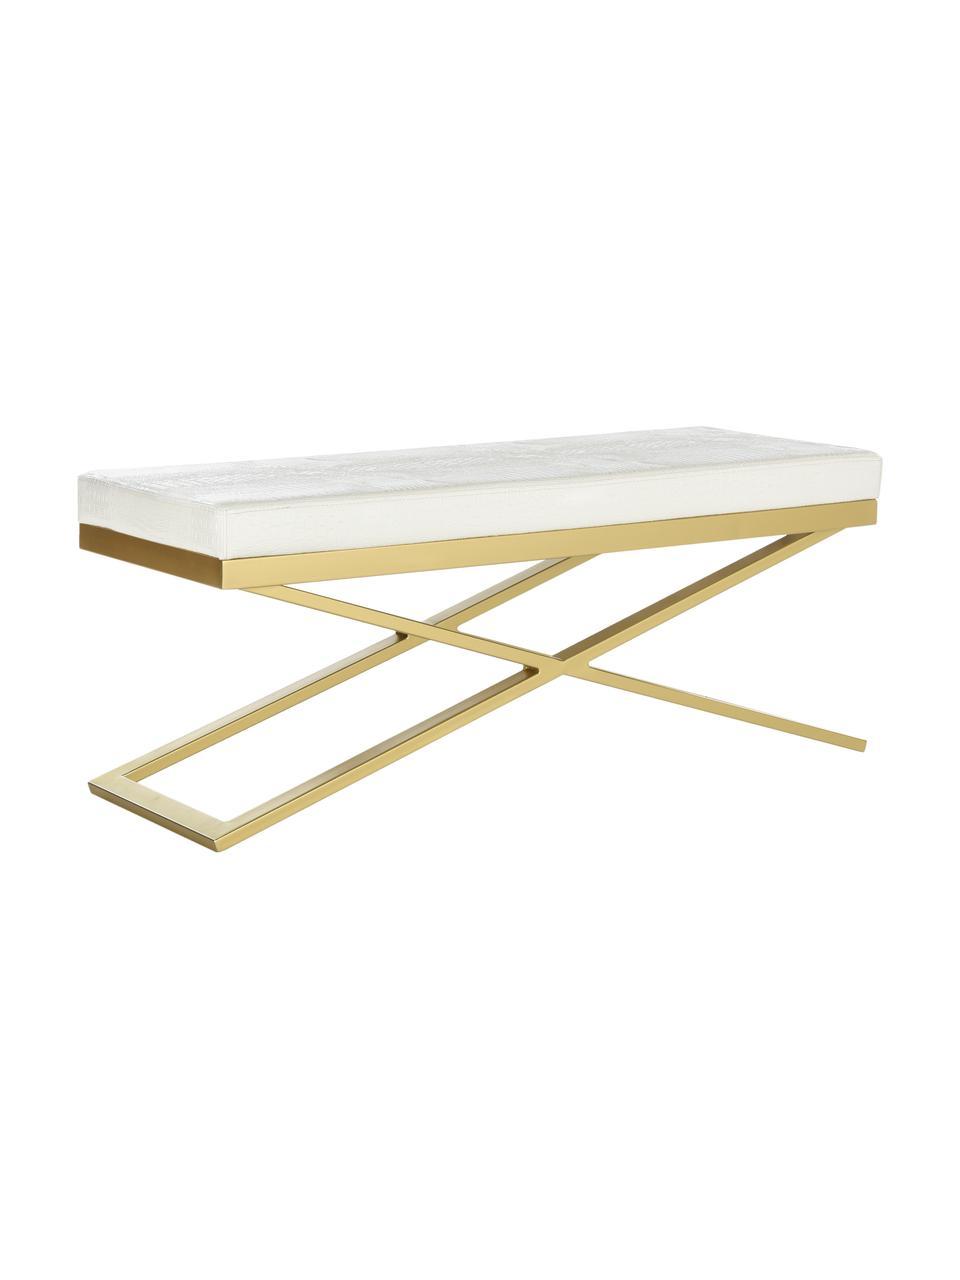 Sitzbank Susan mit Kunstleder, Gestell: Stahl, lackiert, Bezug: Kunstleder (Polyurethan) , Weiß, Goldfarben, 109 x 46 cm